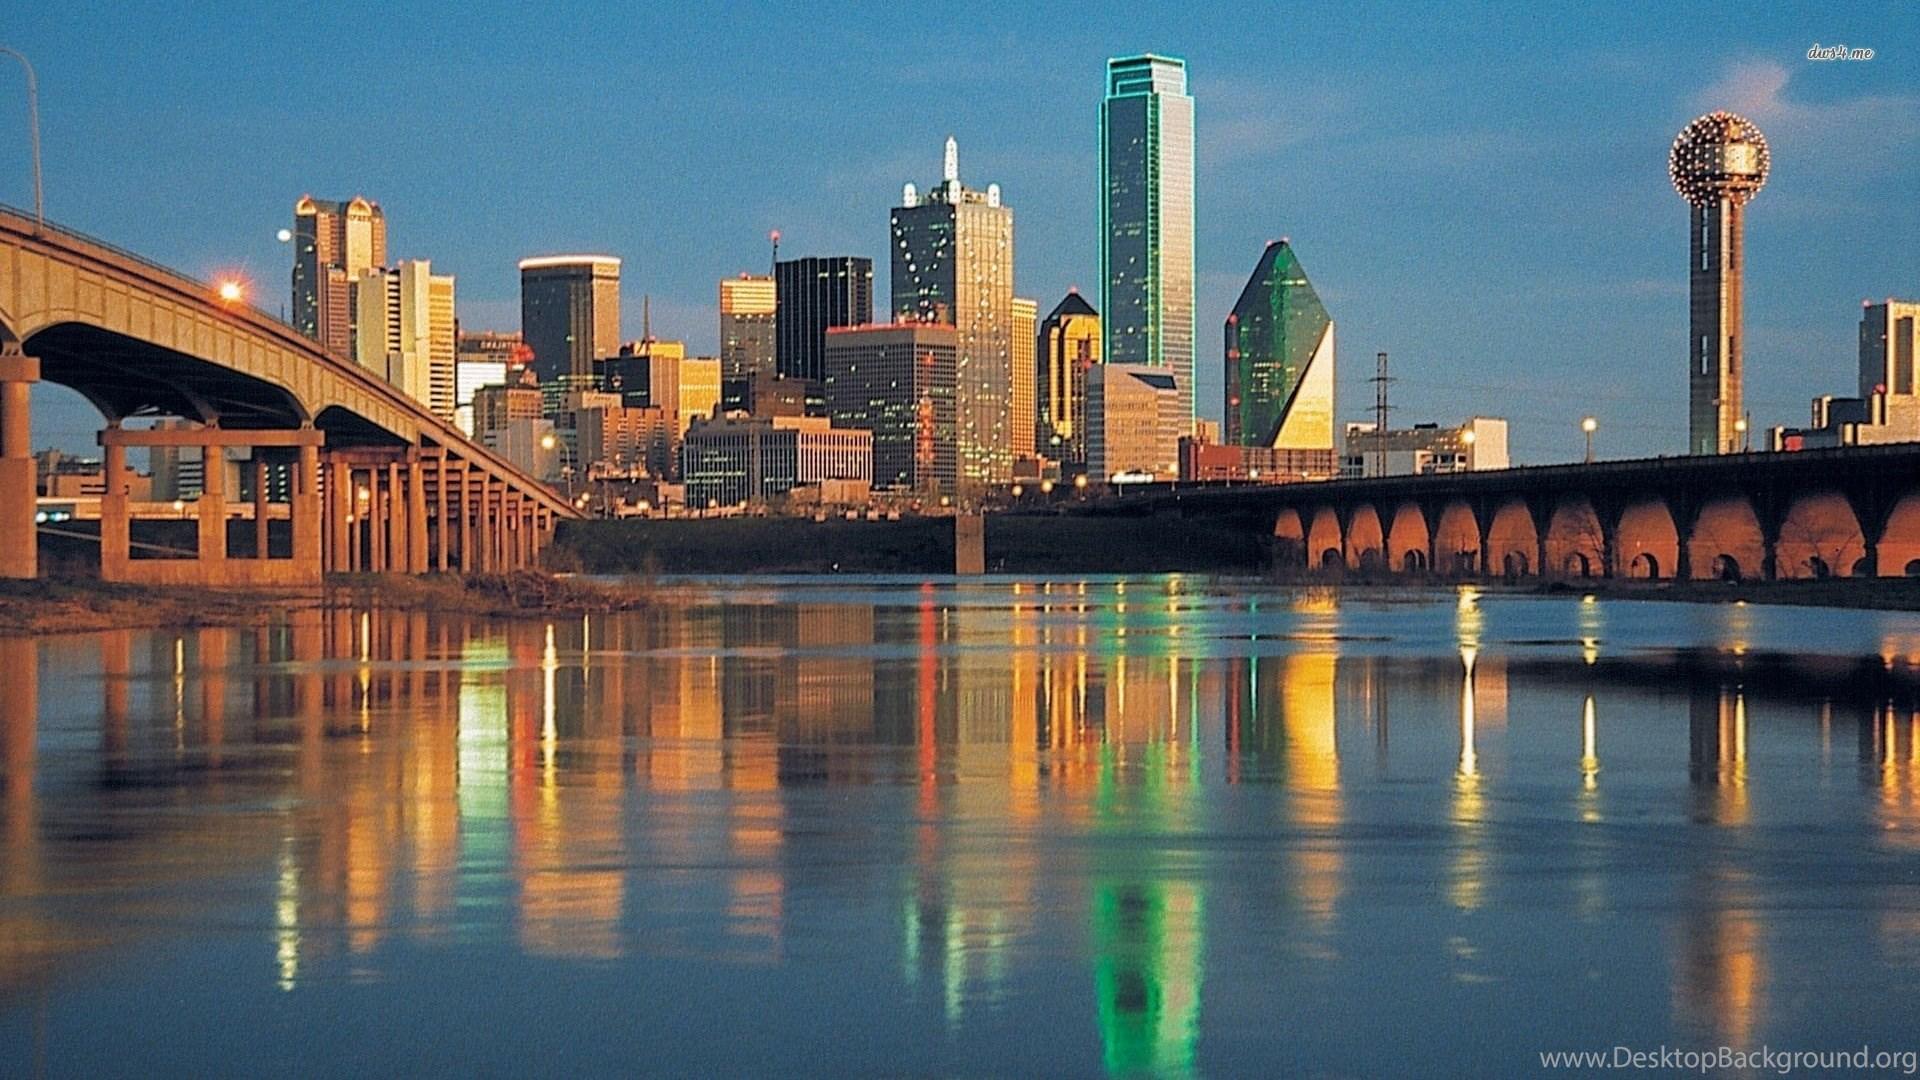 Wallpapers Houston Skyline Dallas World Jpg 1920x1080 Desktop Background